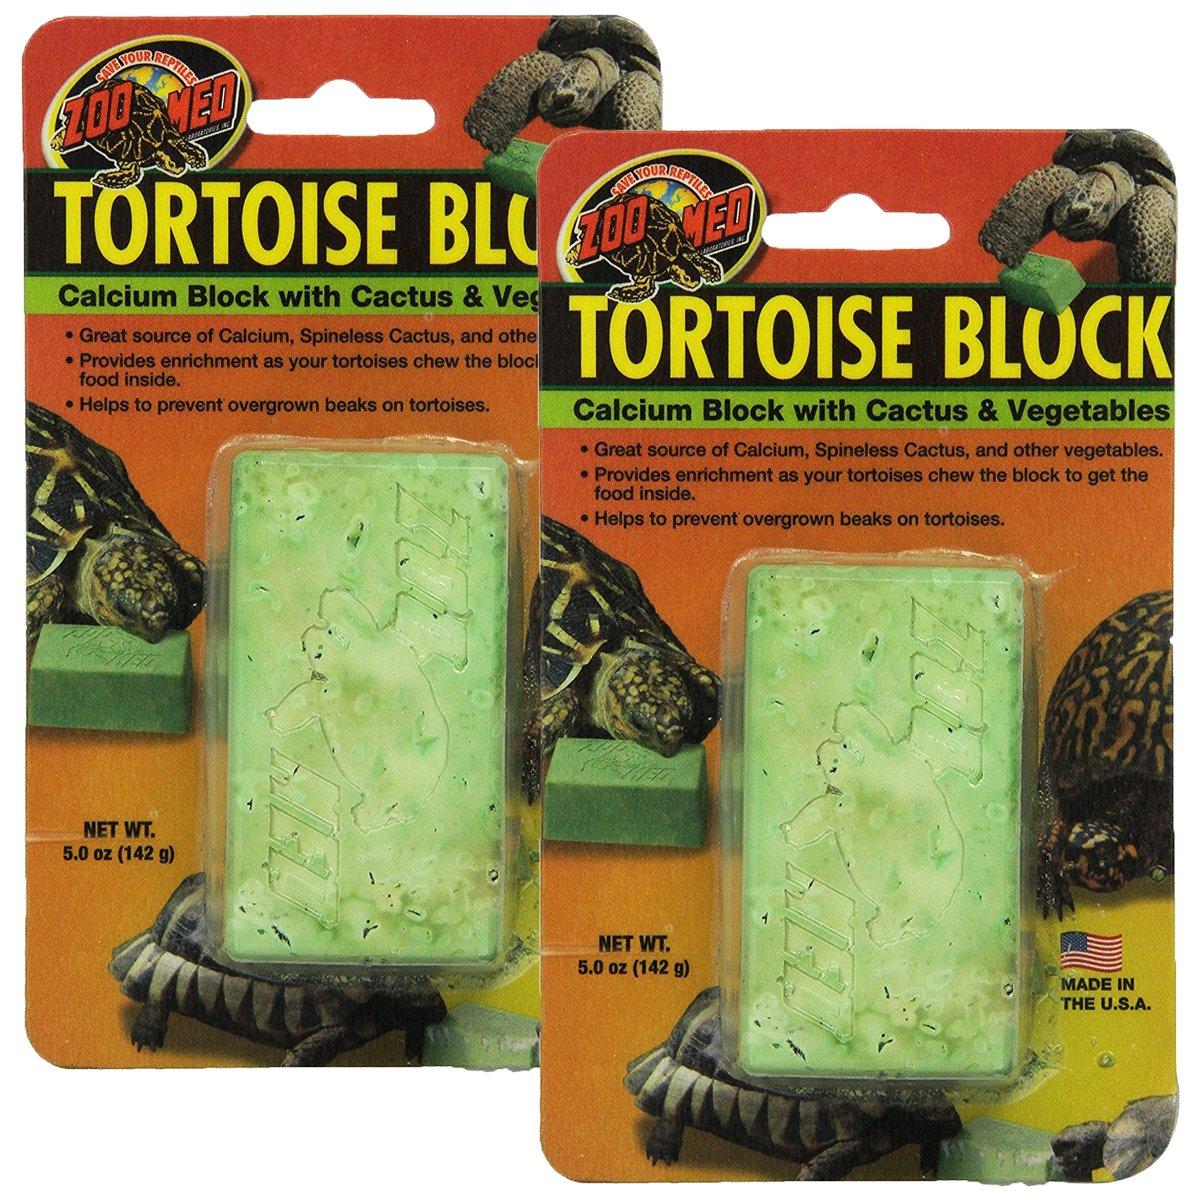 Zoo Med Laboratories SZMBB55 Tortoise Banquet Block, Net WT 10 oz